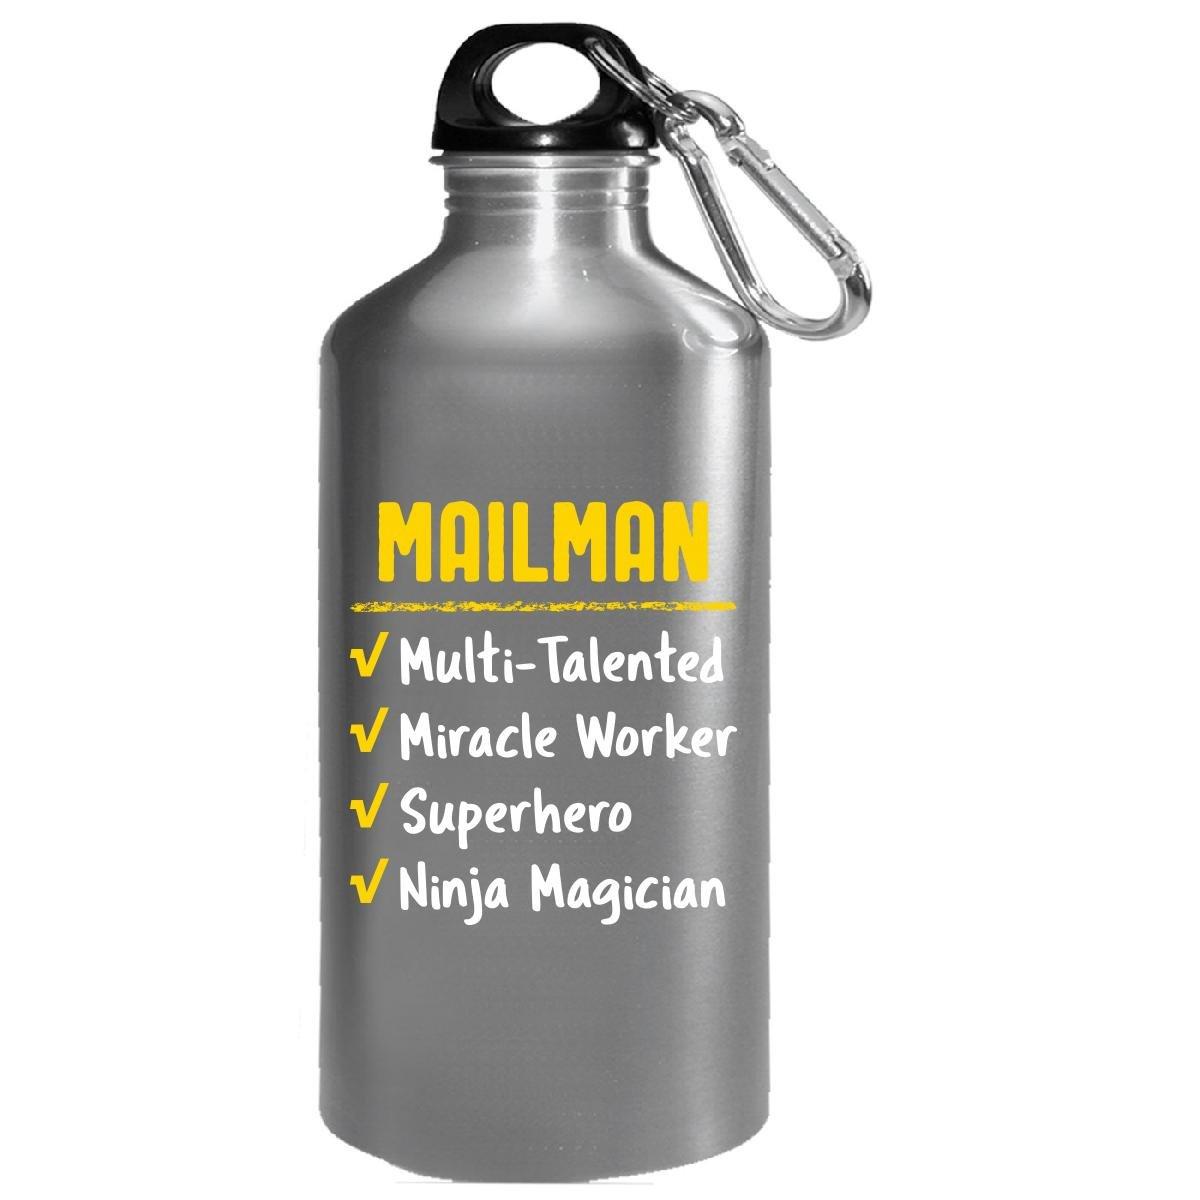 Amazon.com : Mailman Miracle Worker Superhero Ninja Funny ...